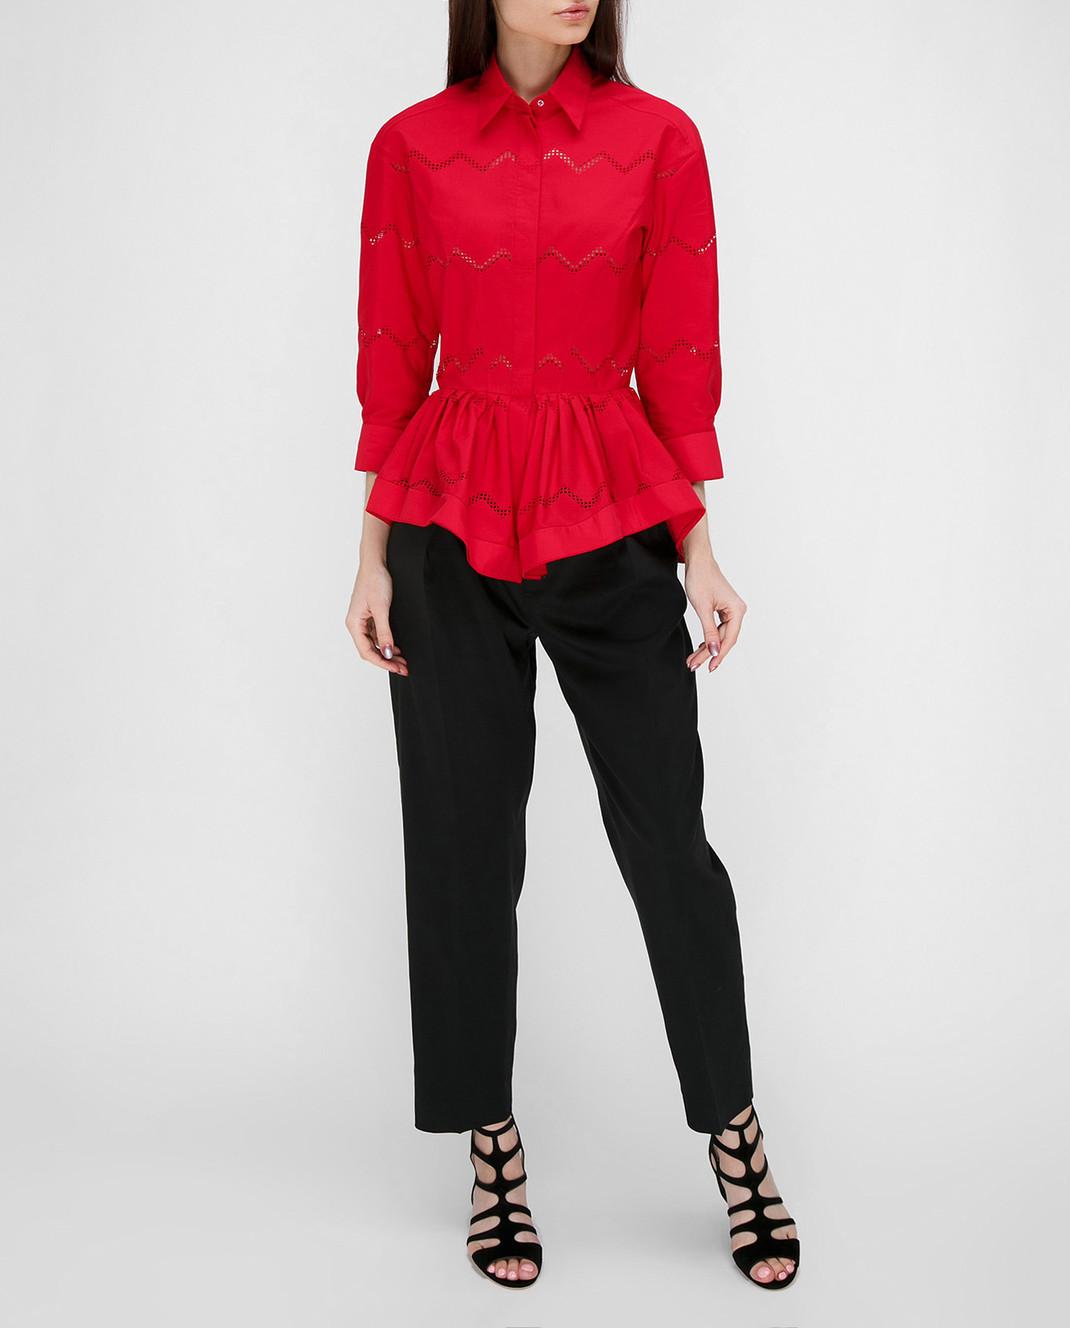 Azzedine Alaia Красная блуза 7S9C081RTL49 изображение 2